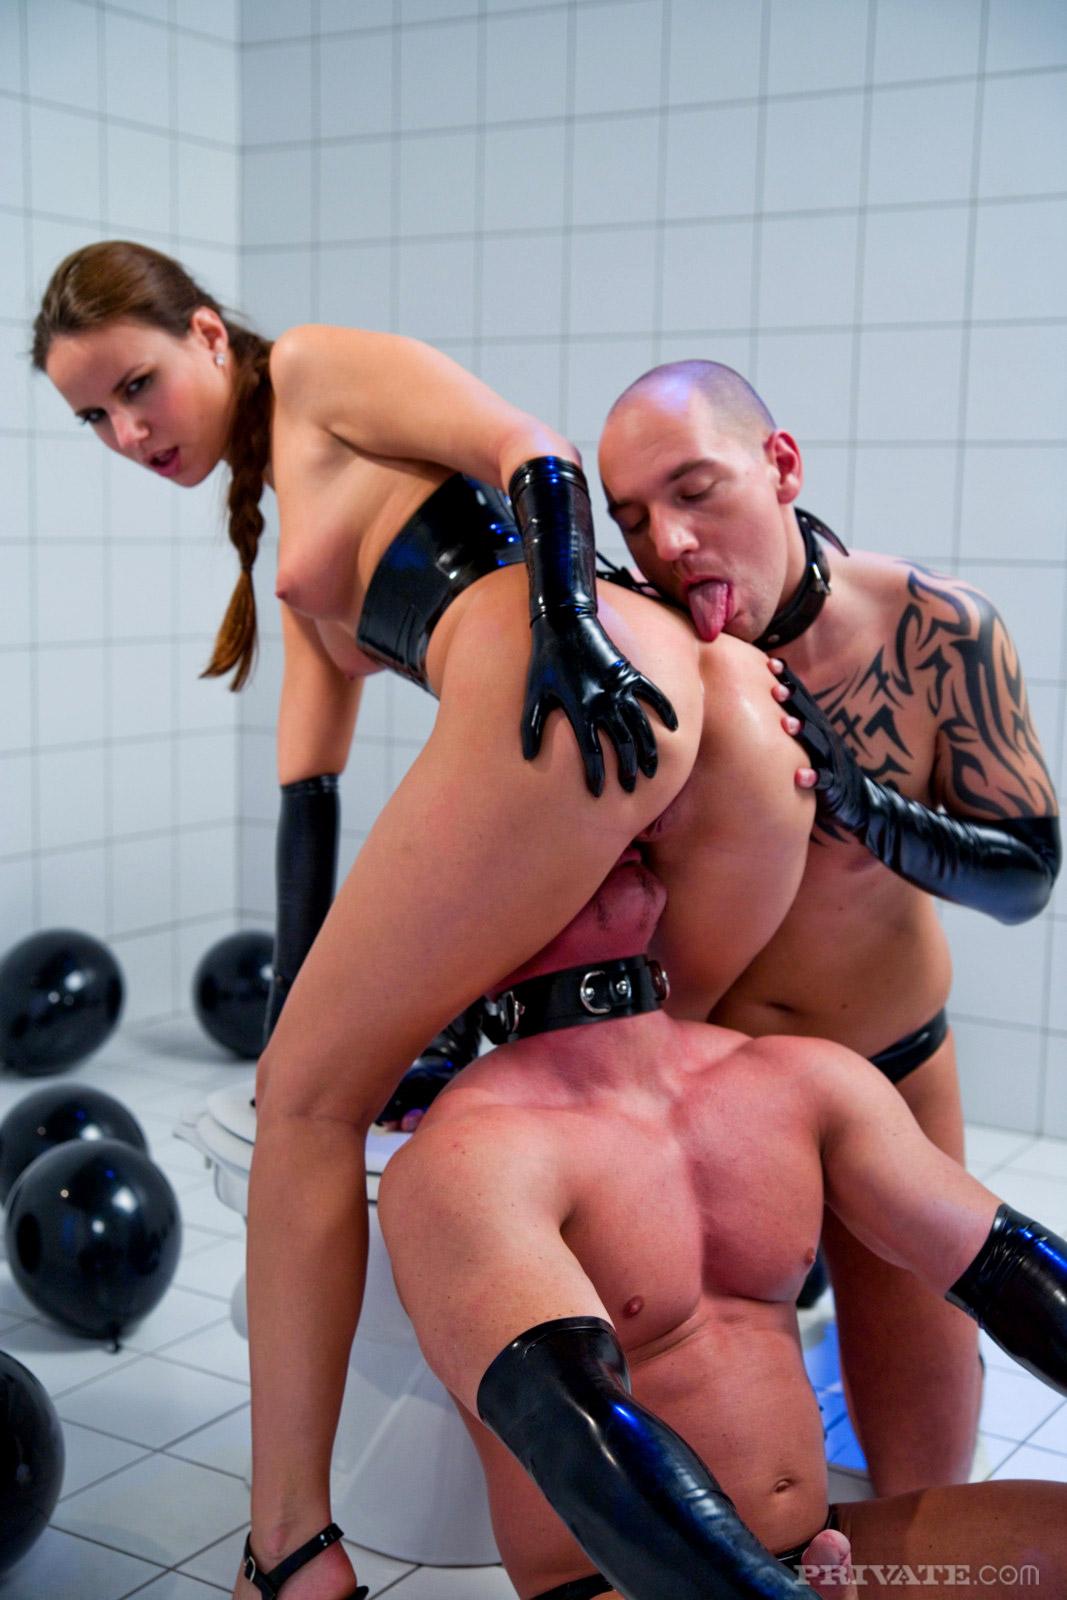 stundenhotel stuttgart private sex berlin